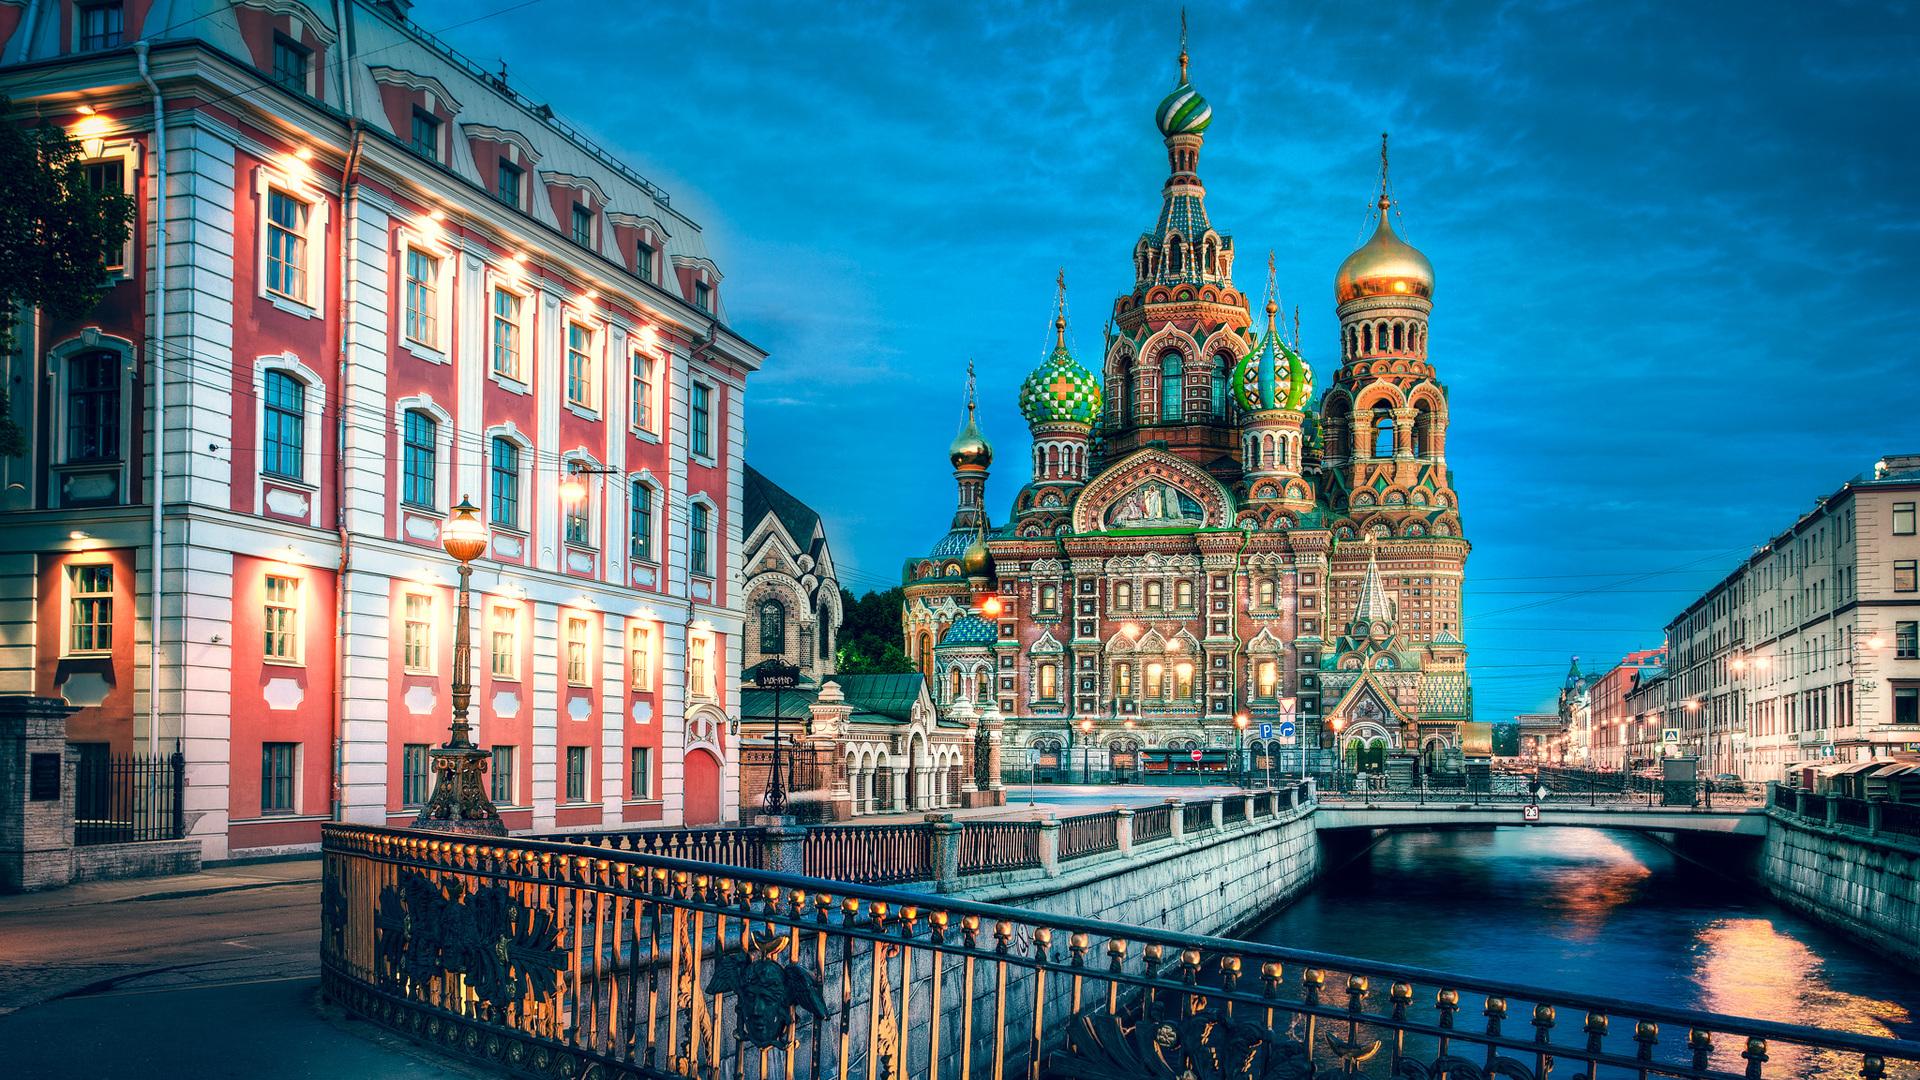 Saint Petersburg Backgrounds on Wallpapers Vista